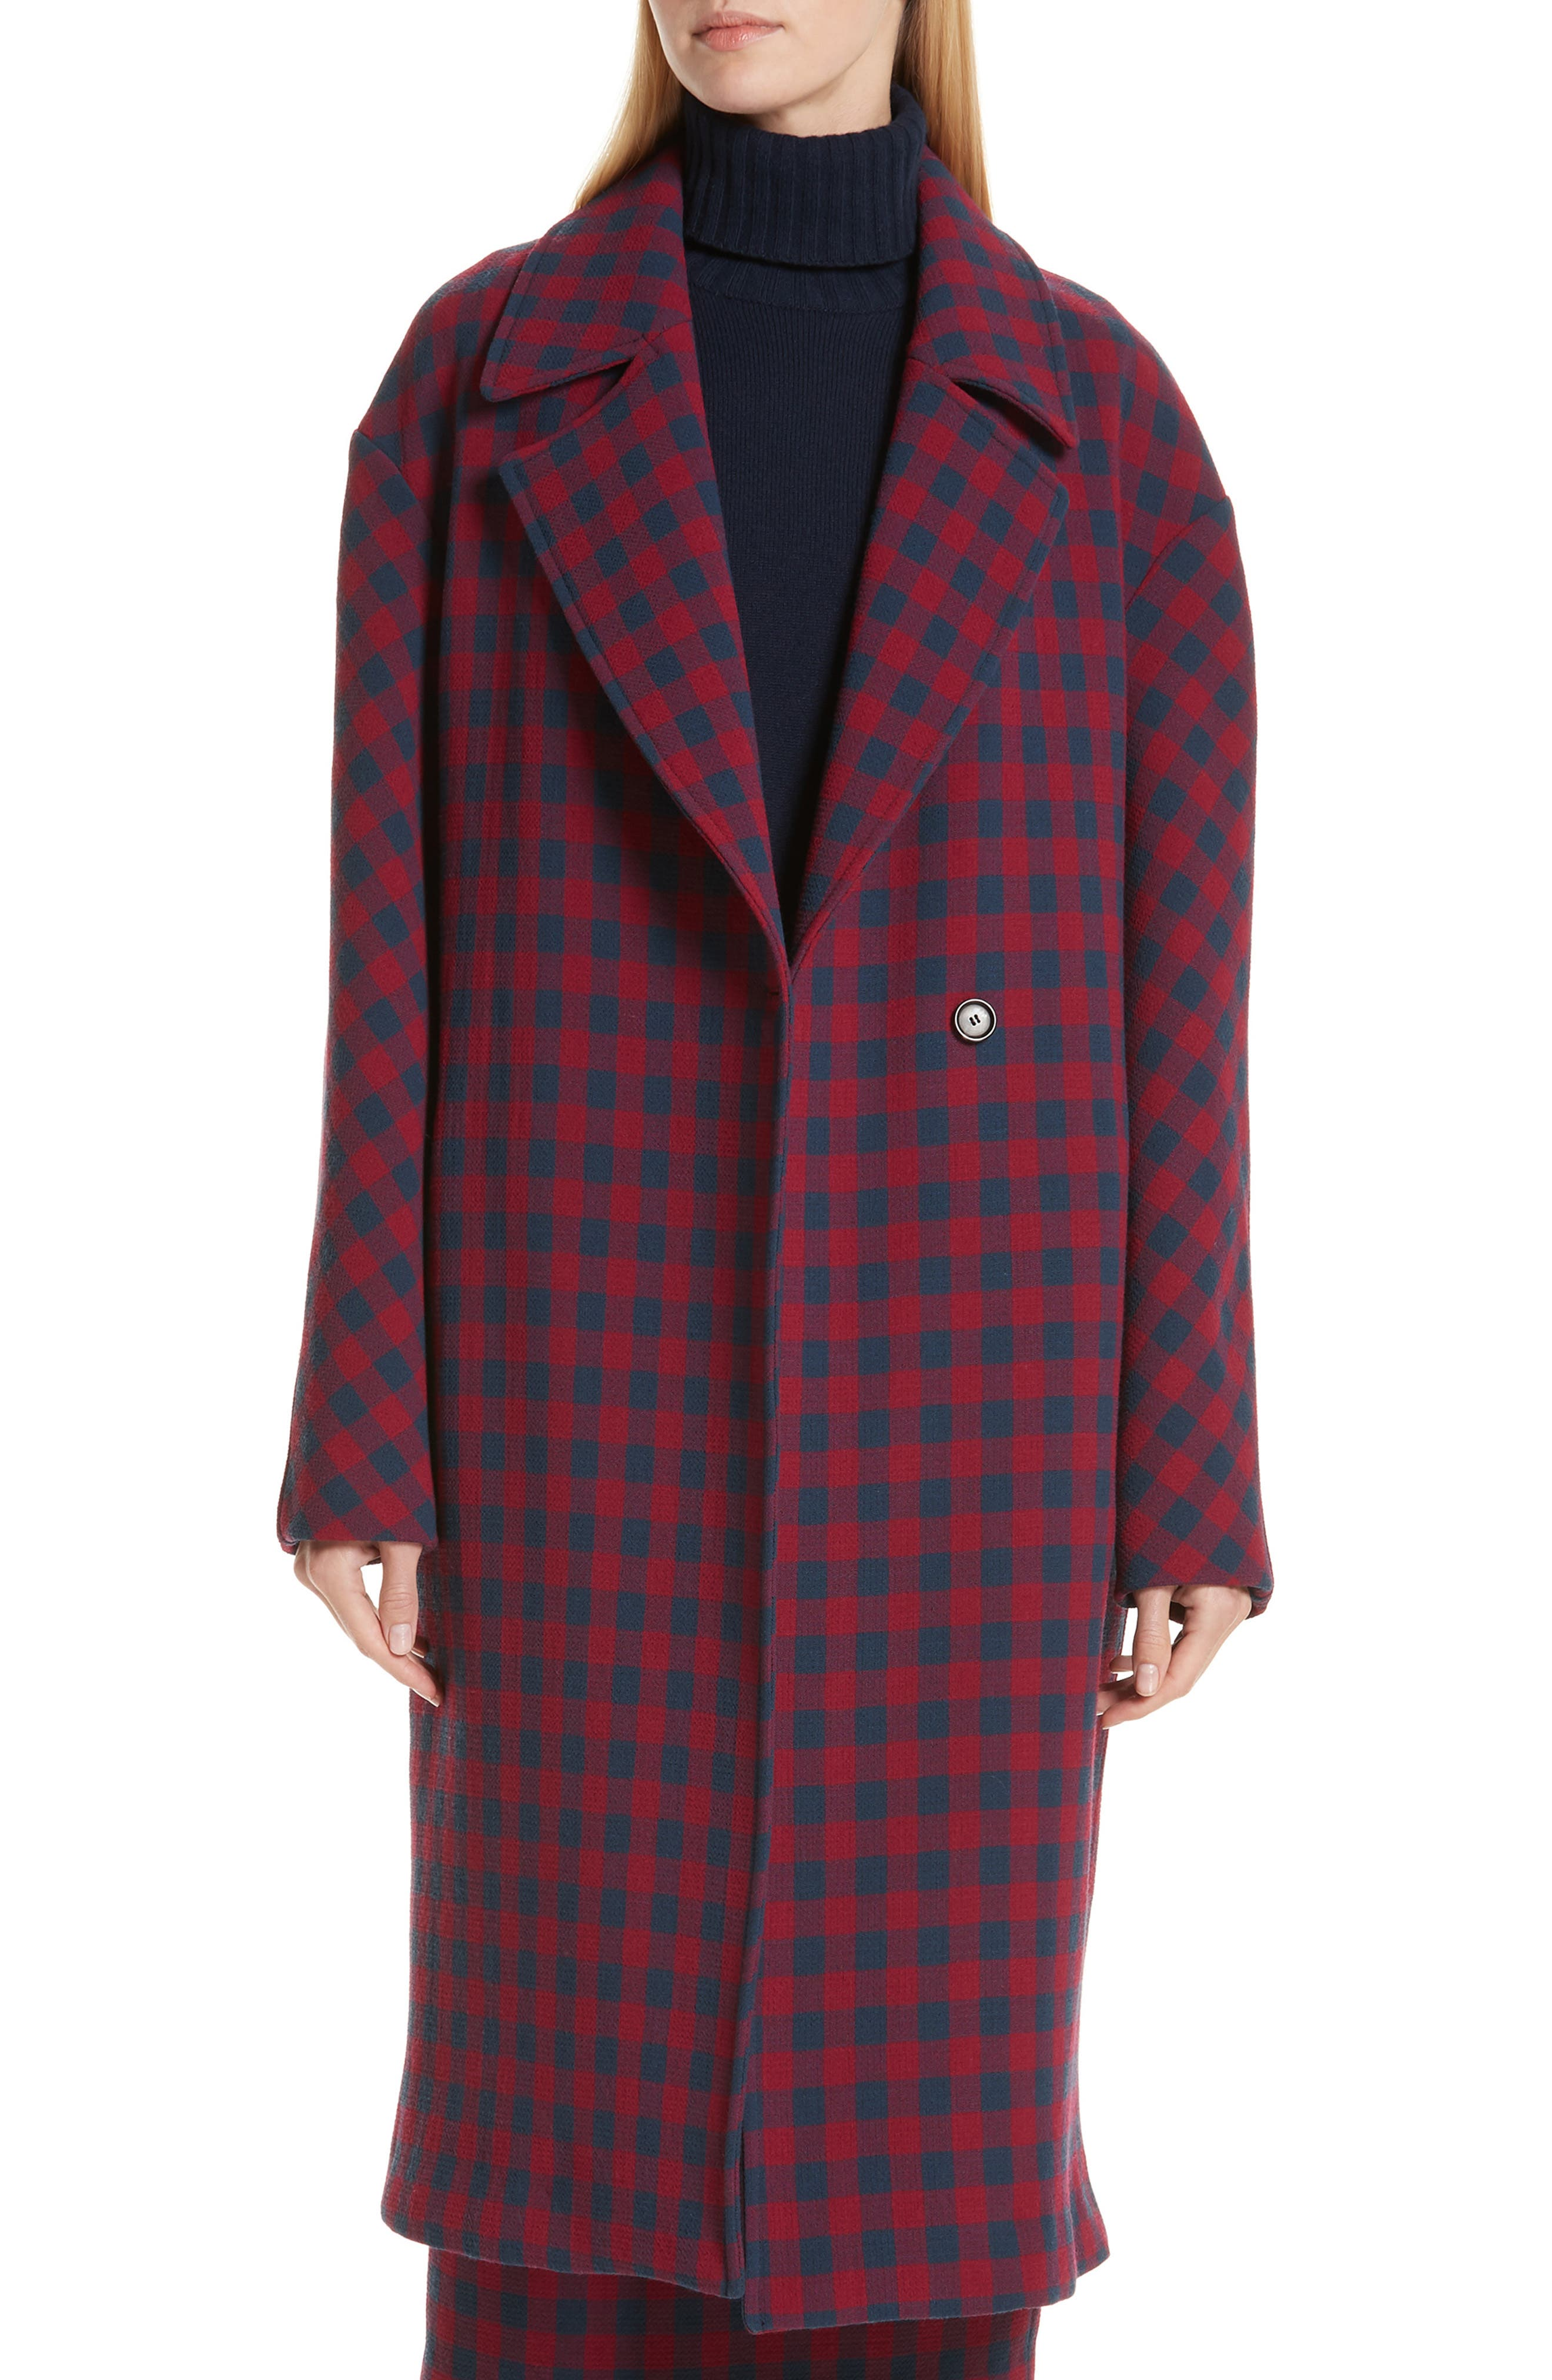 Copeland Check Crepe Coat, Main, color, BERRY/ NAVY